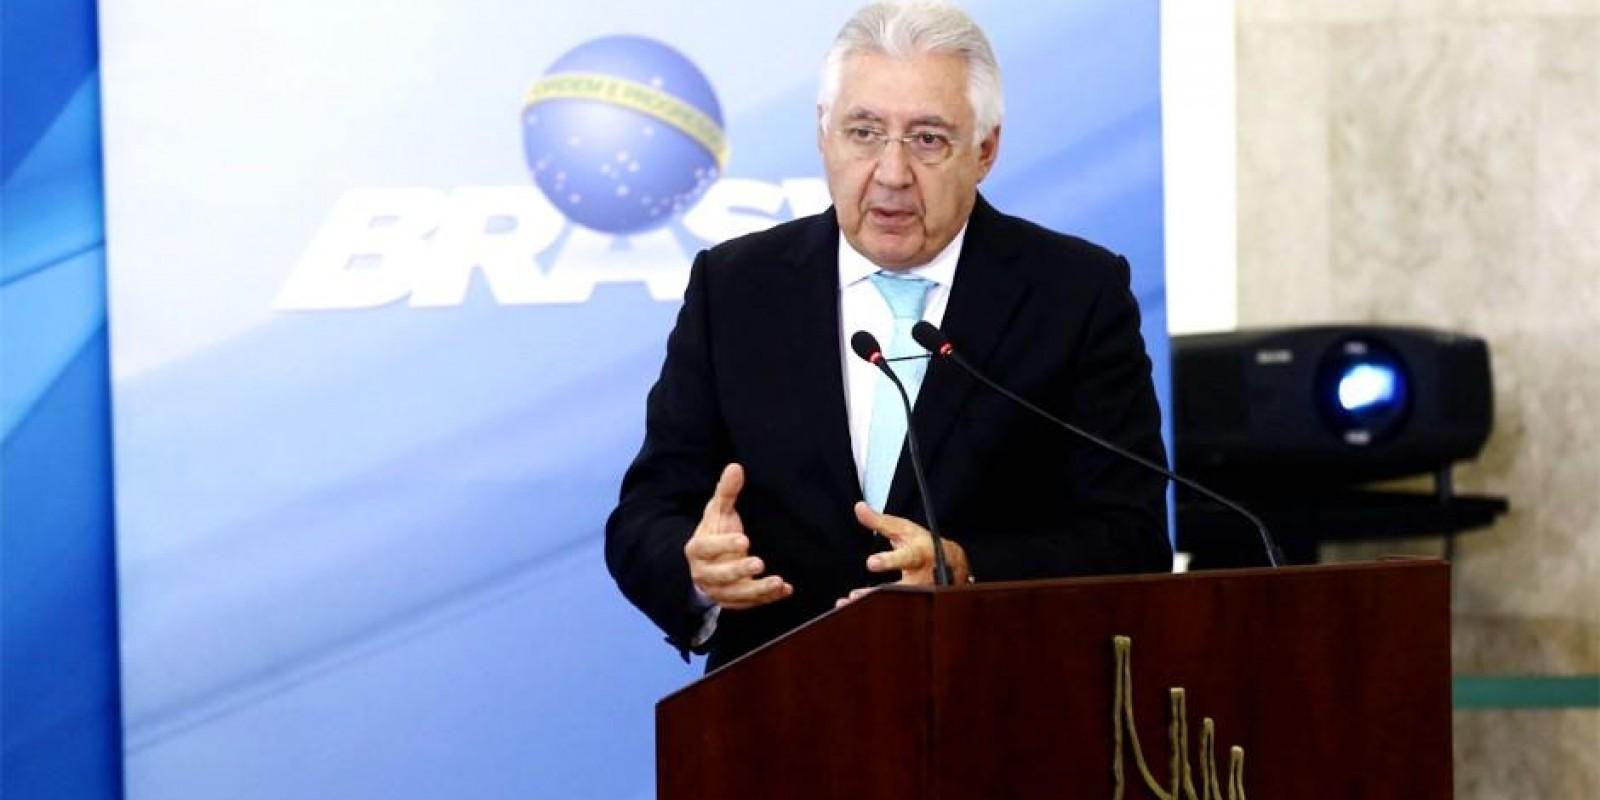 Programa do Sebrae irá liberar R$ 8,2 BI